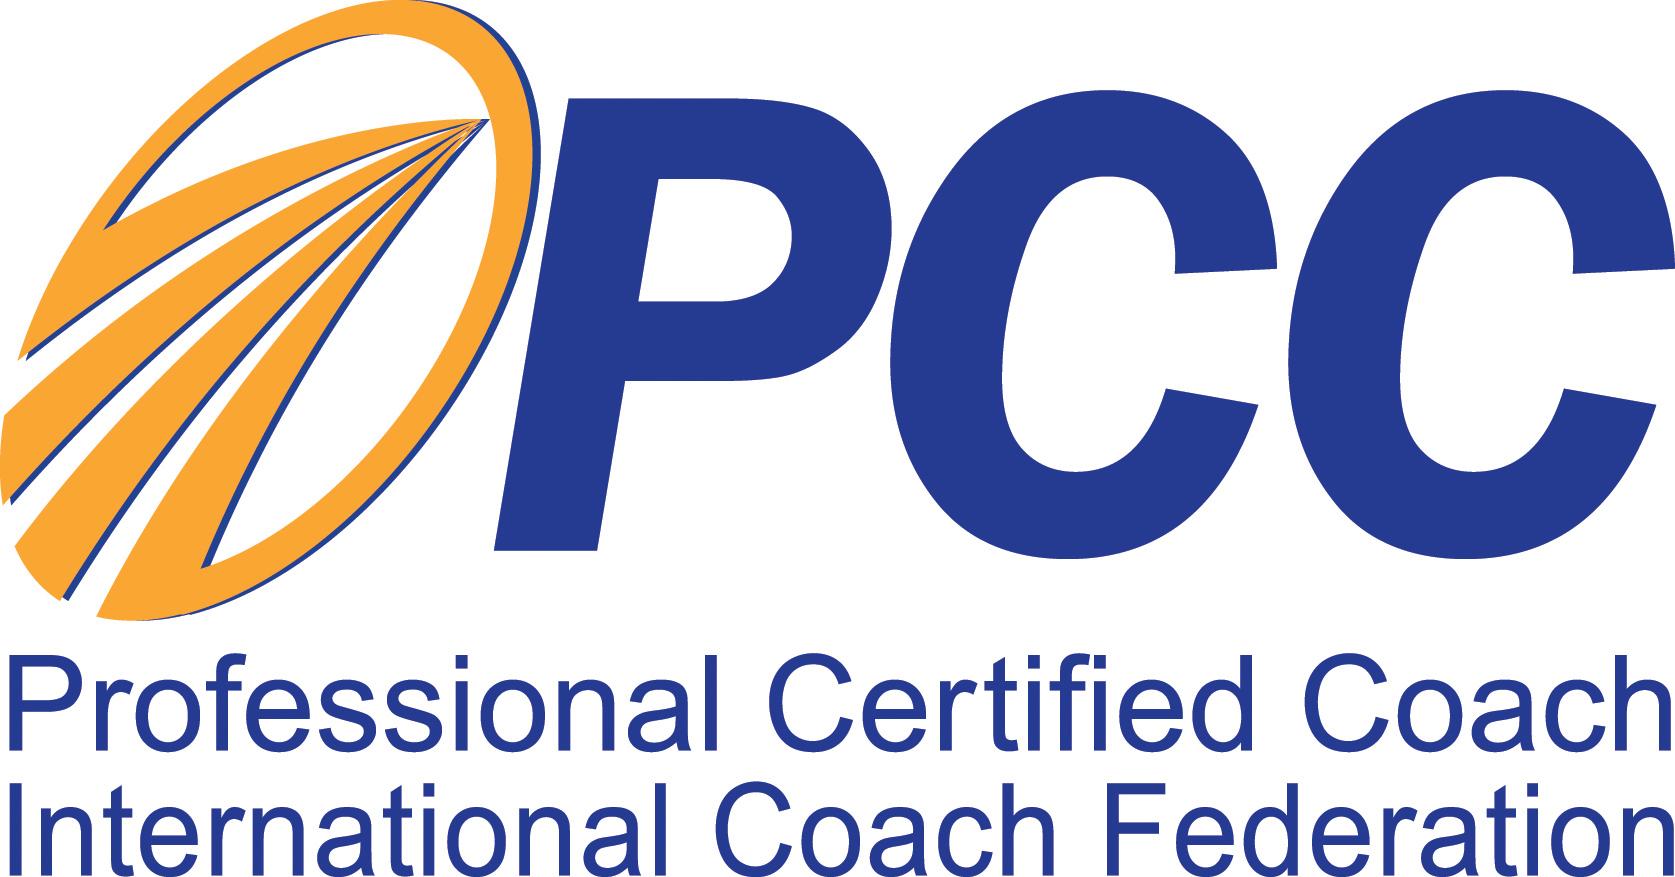 Professional Certified Coach International Coach Federation logo - jpg, 1675x877